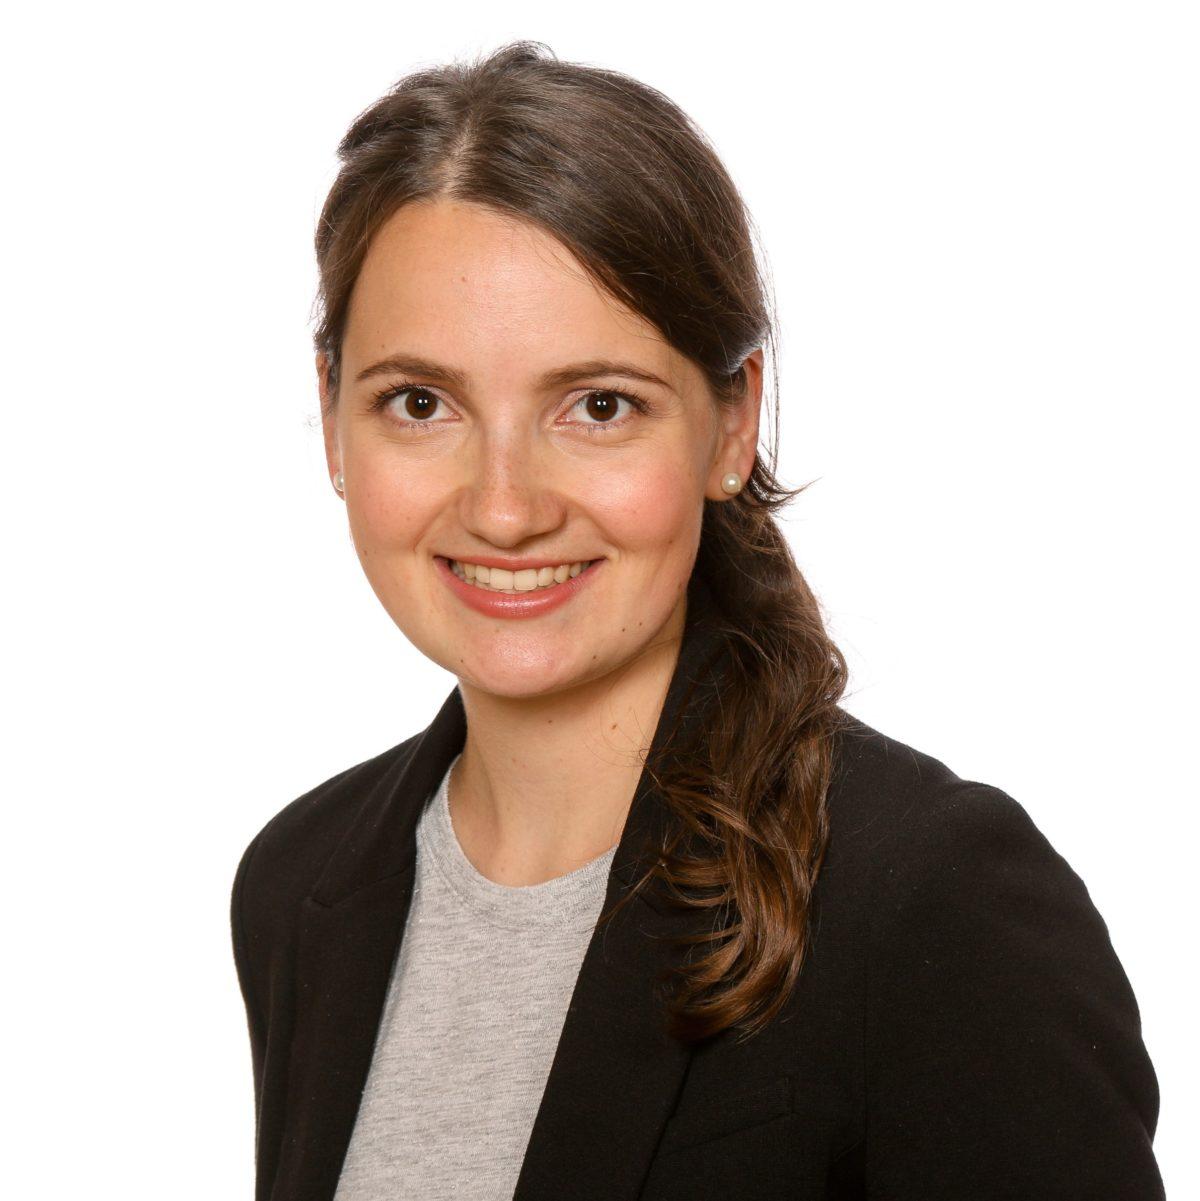 Katerina Lanickova